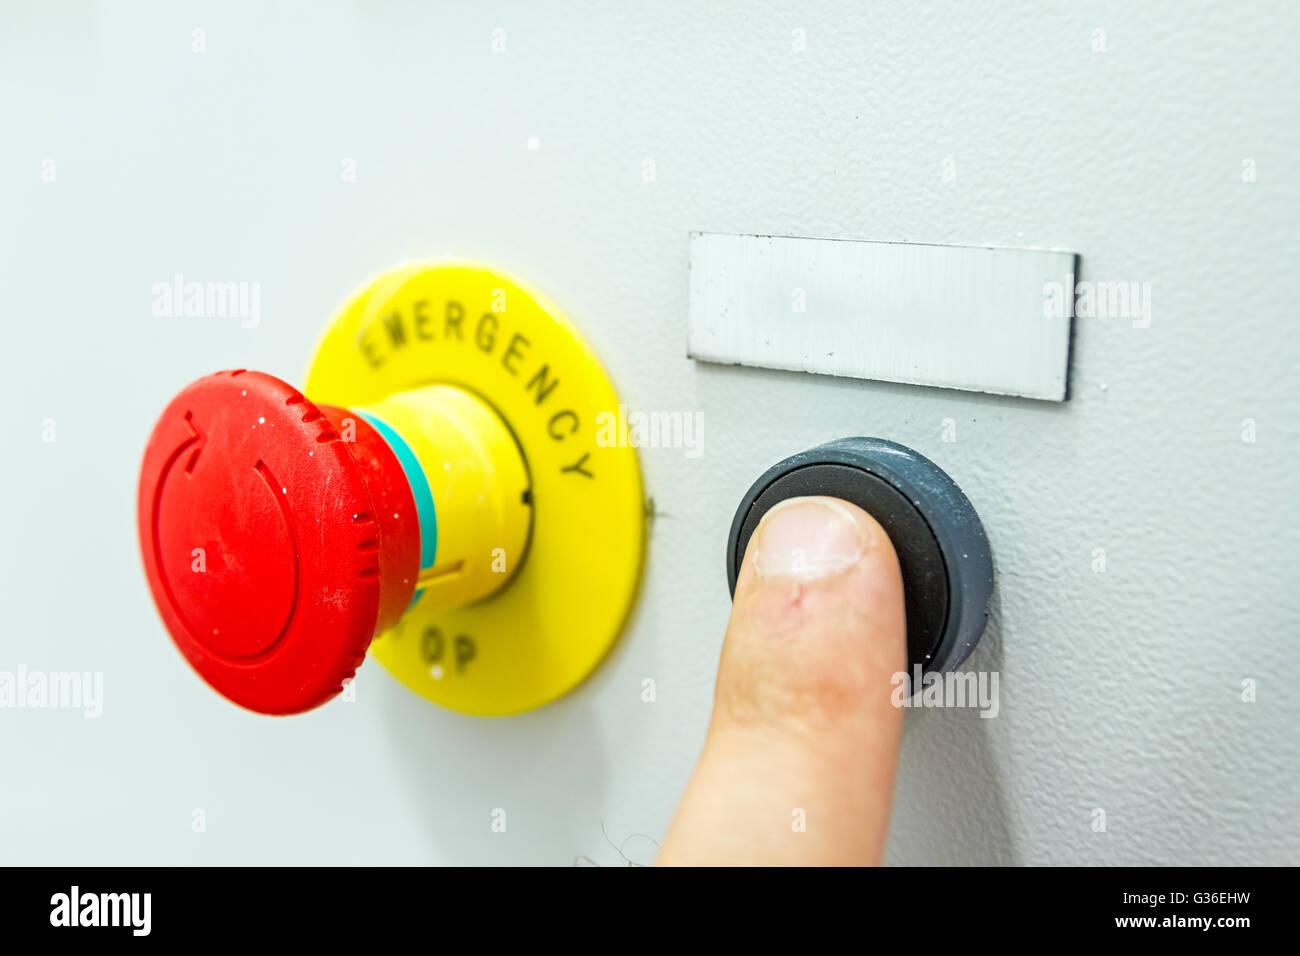 reset fuse box with emergency red shutdown panic button stock rh alamy com fuse box restore fuse box restaurant